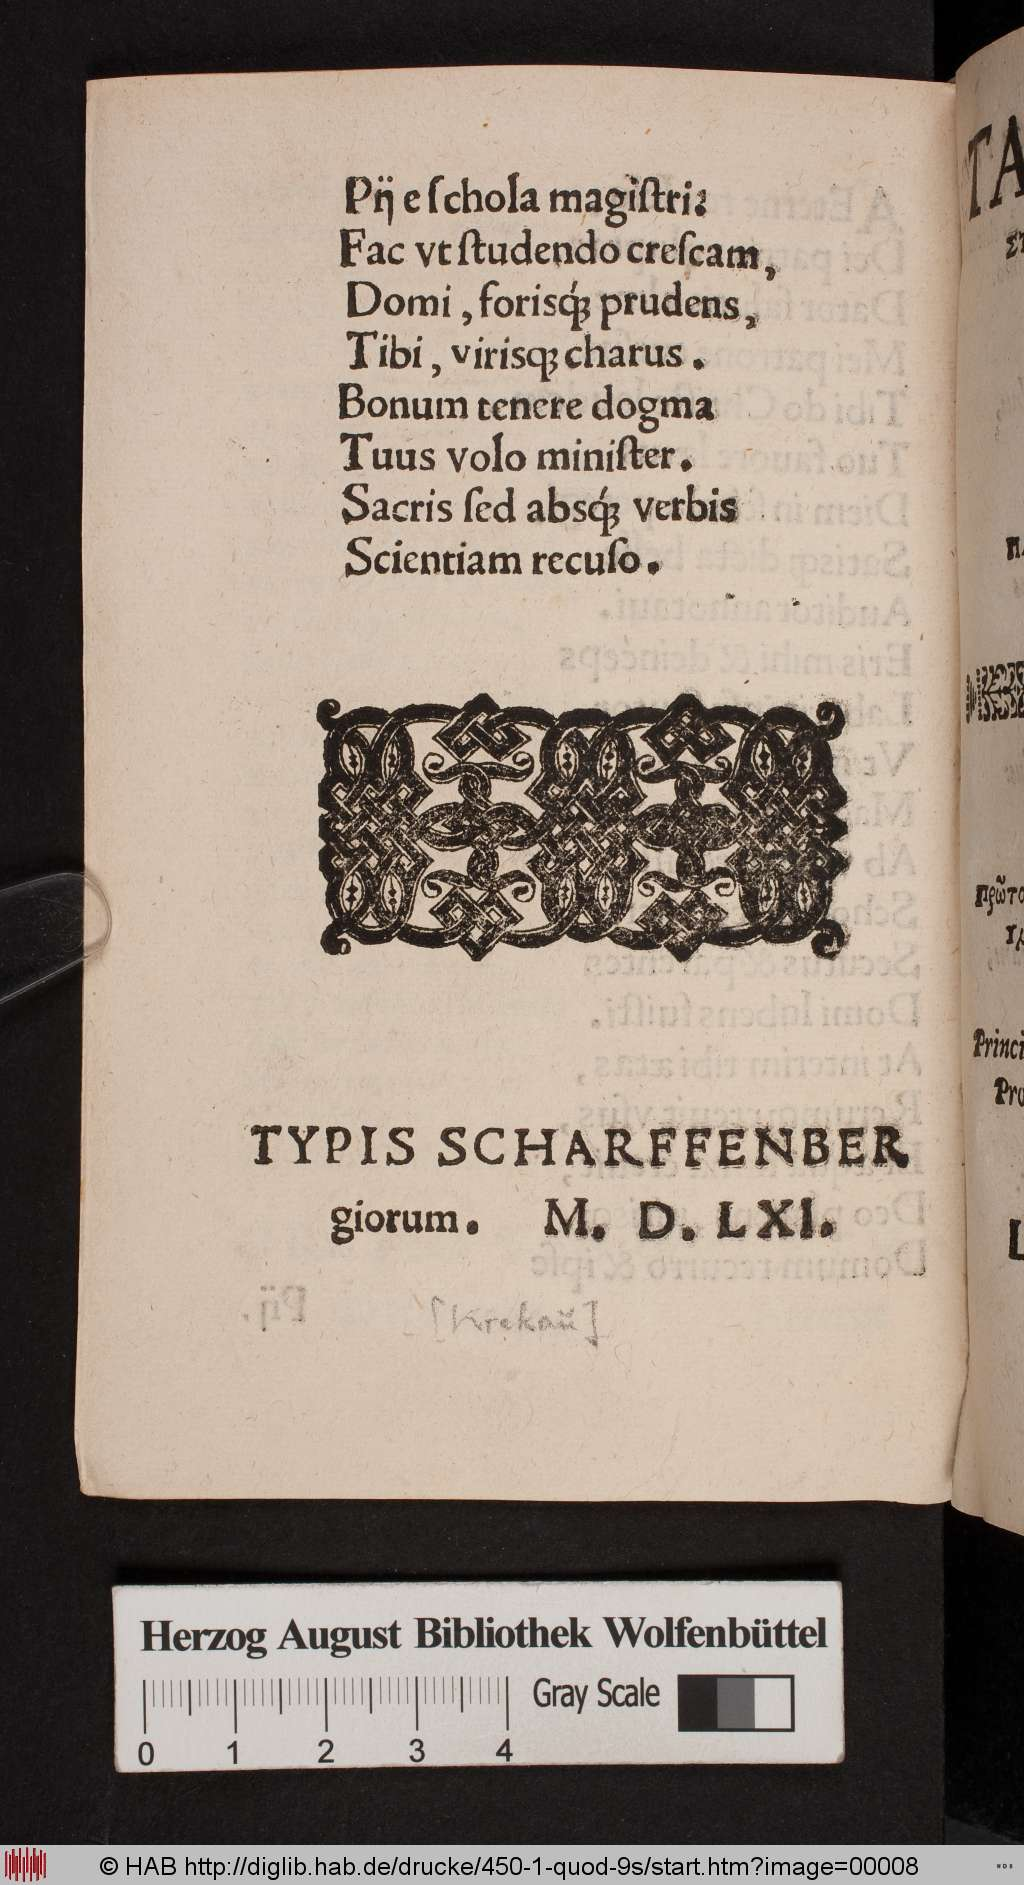 http://diglib.hab.de/drucke/450-1-quod-9s/00008.jpg